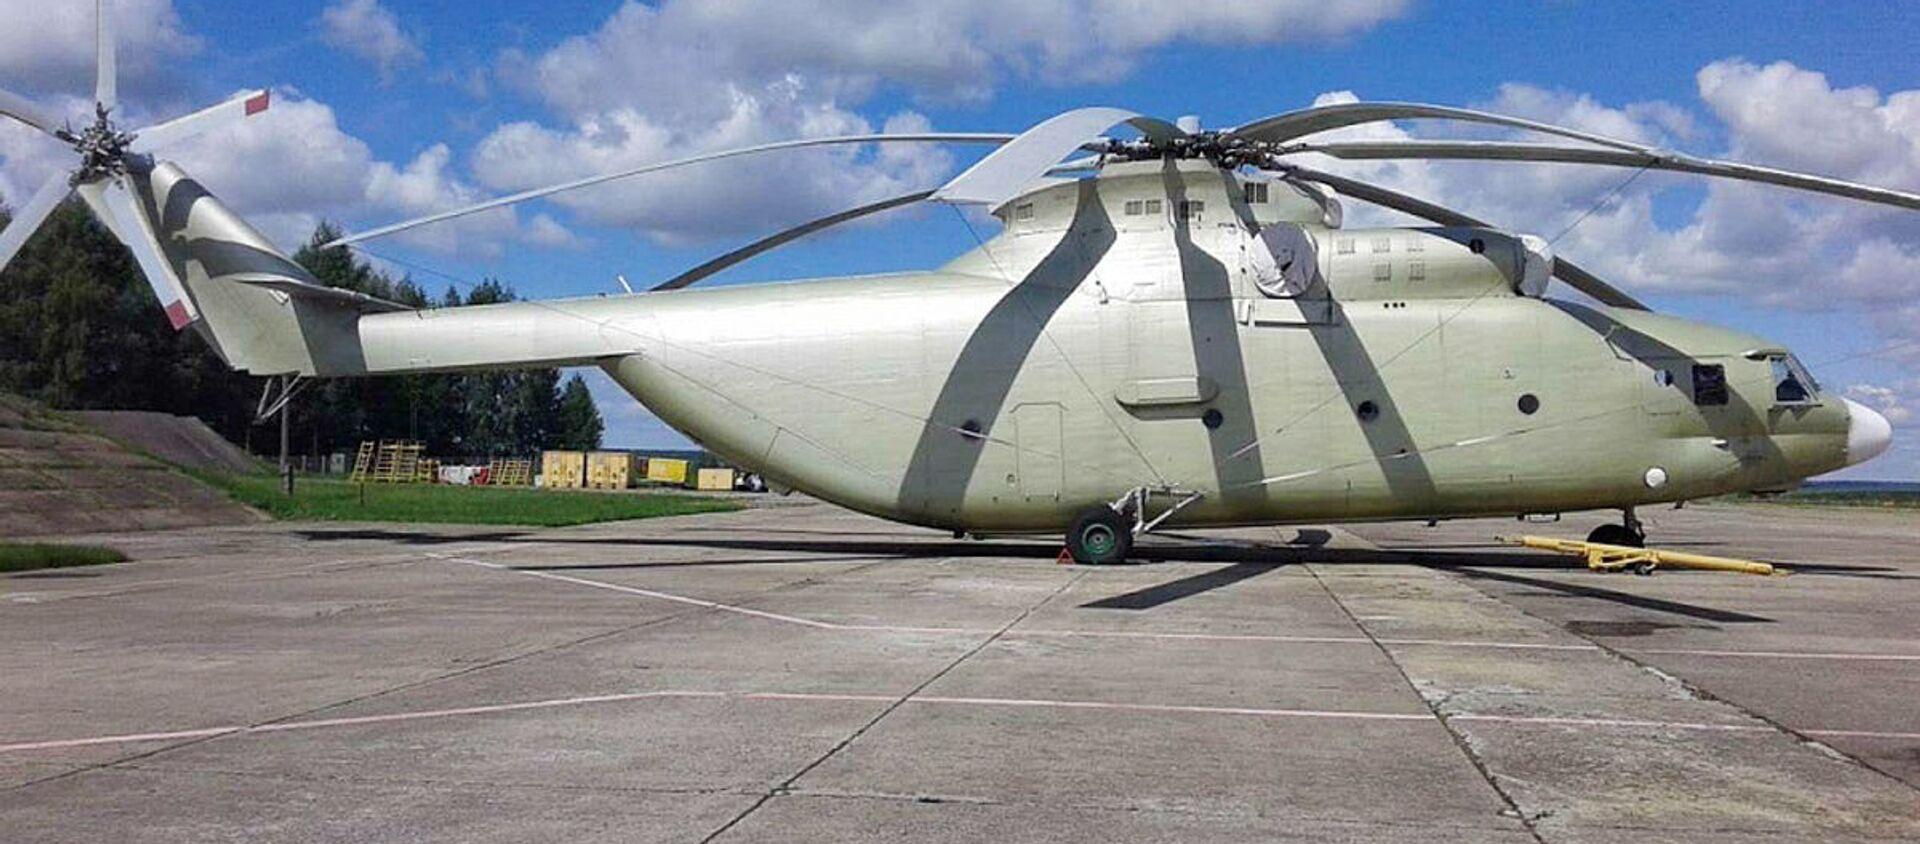 Vertolet Mi-26 - Sputnik Oʻzbekiston, 1920, 09.12.2020